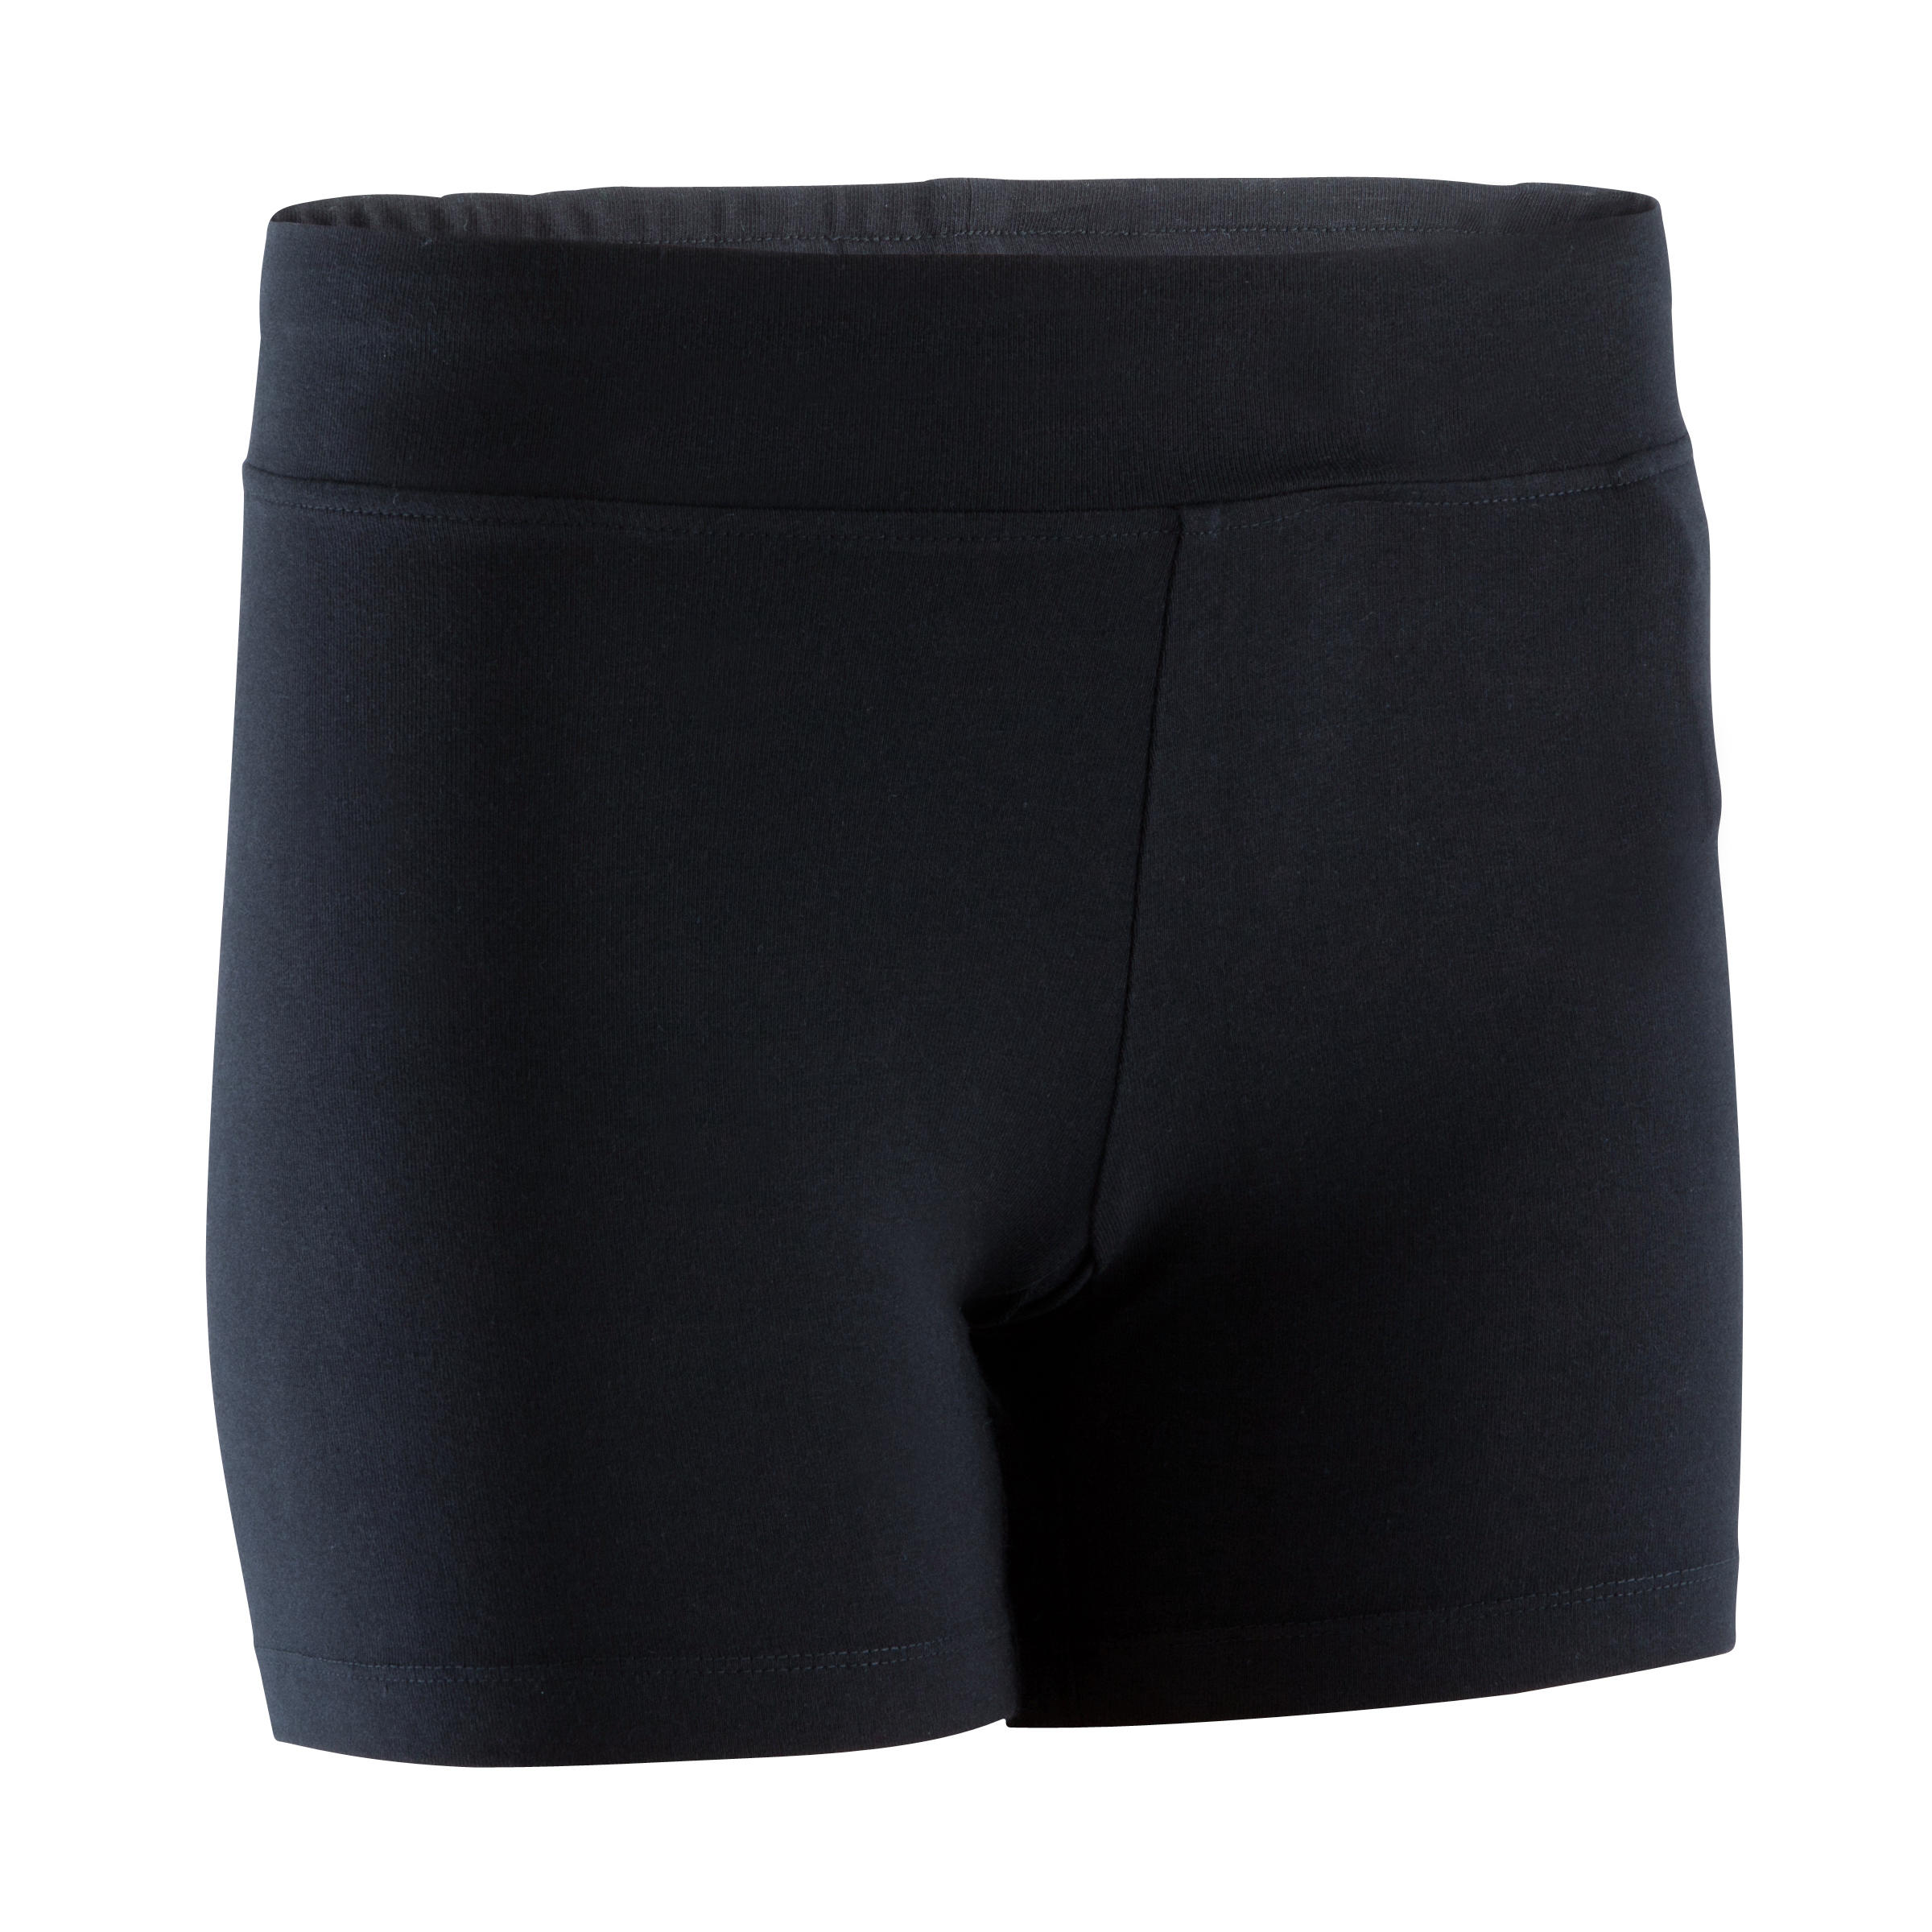 Short corto FIT+ slim, fitness mujer, negro